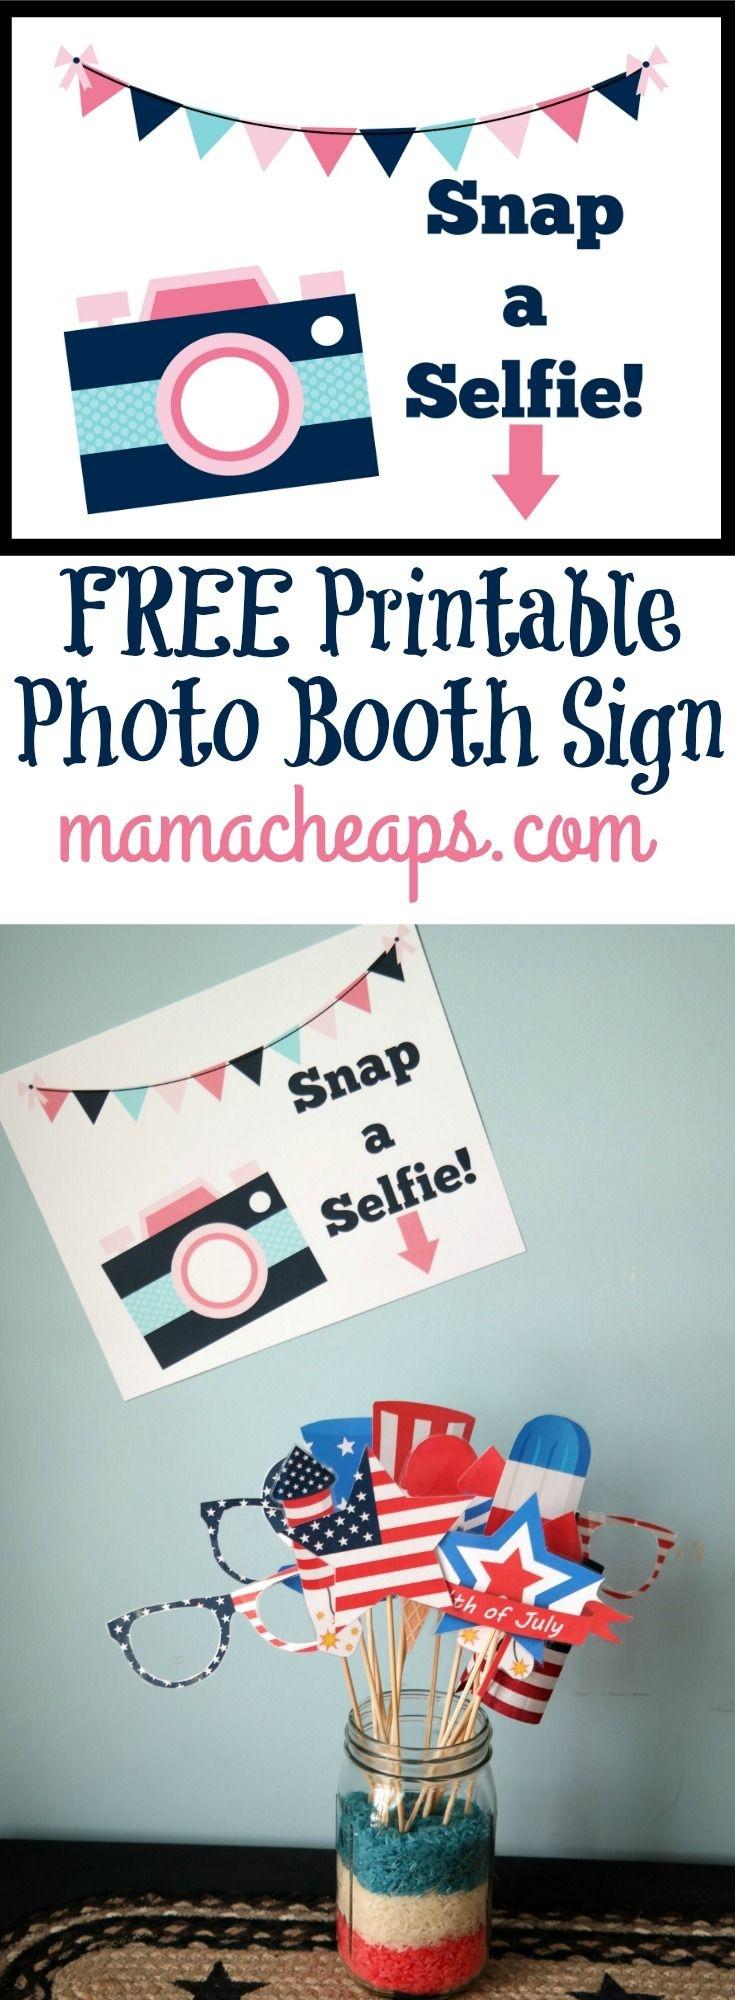 Free Printable Photo Booth Sign | Kids: Kid Birthday Party Ideas - Selfie Station Free Printable